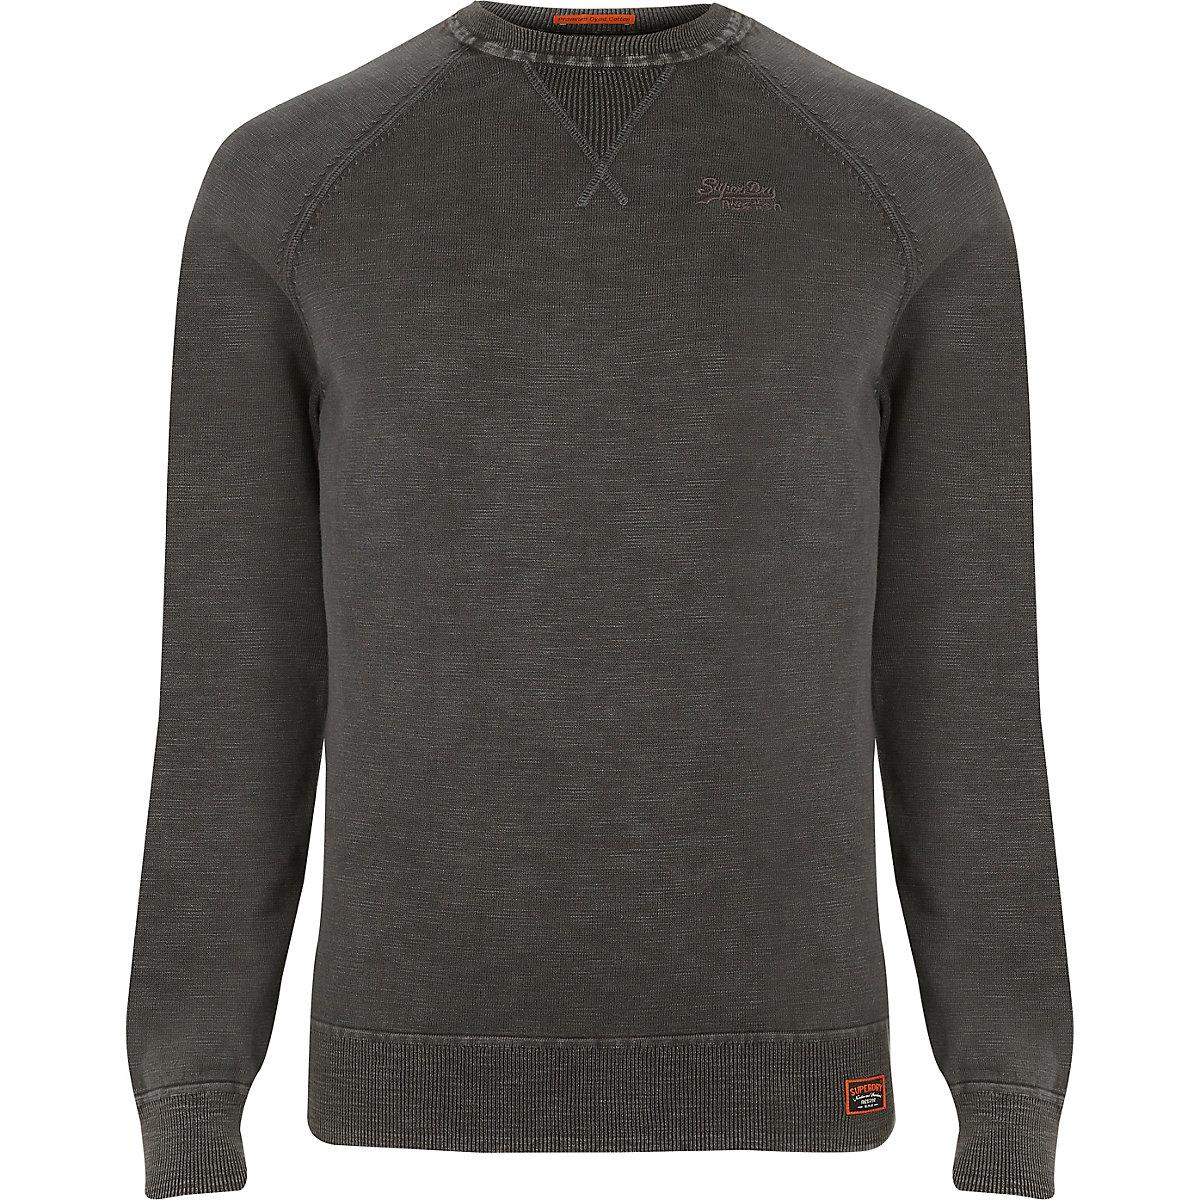 Superdry black sweater